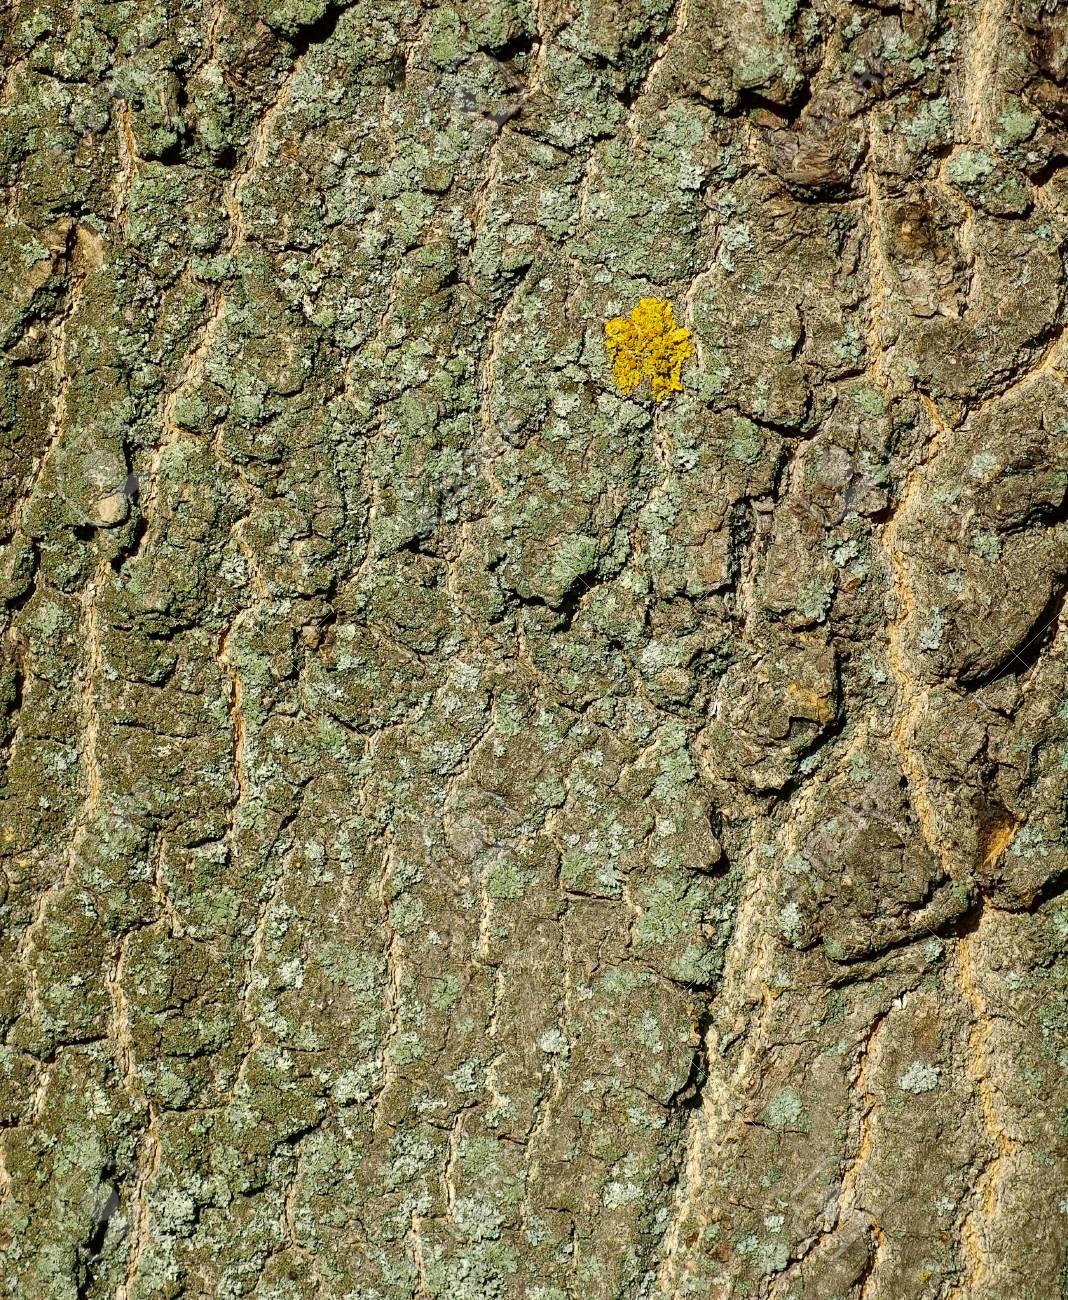 Image oak bark as a background Stock Photo - 20583375